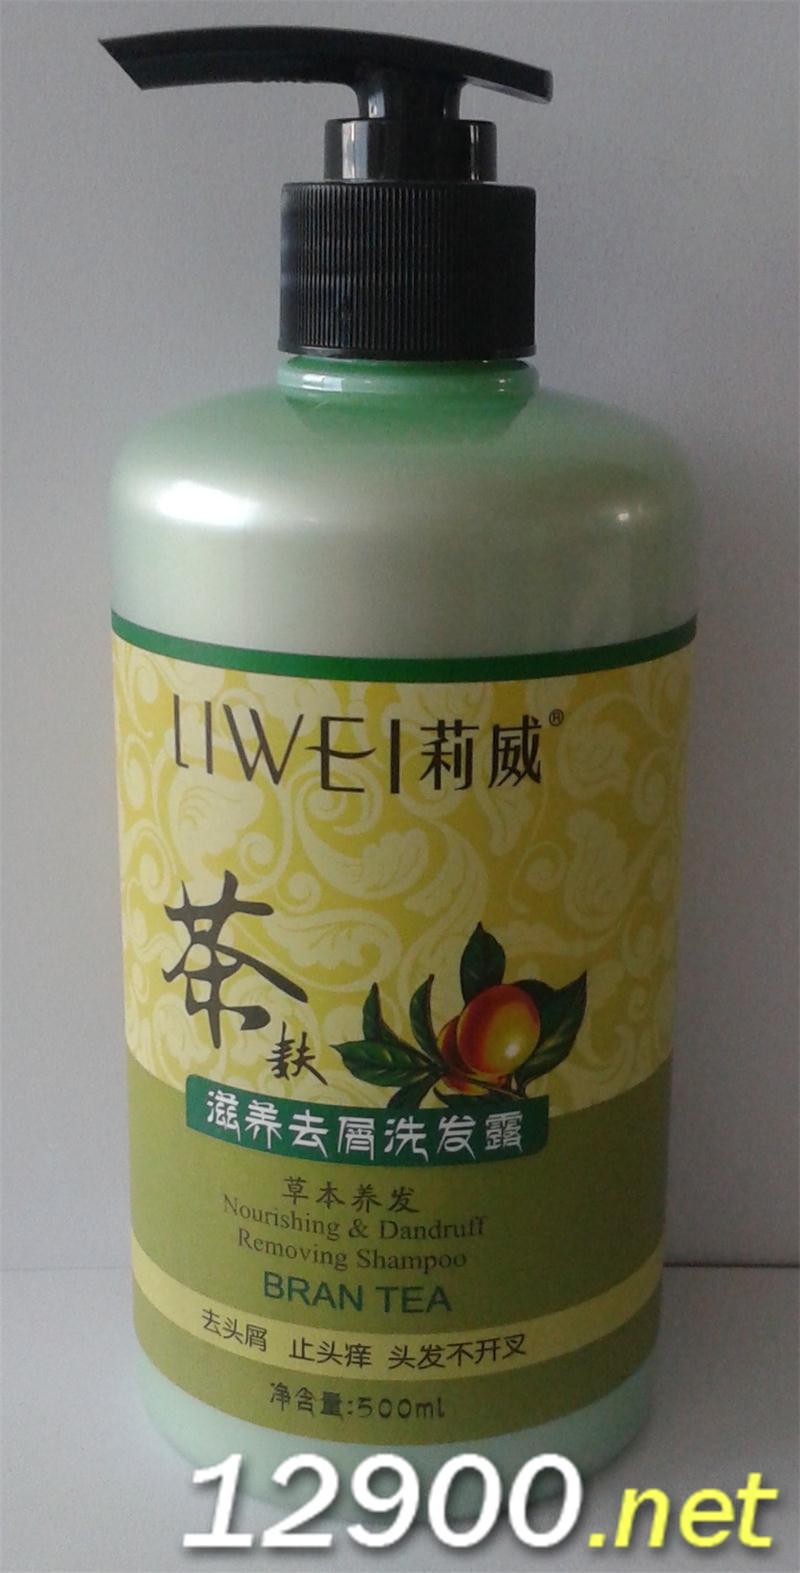 500ML茶麸滋养去屑洗发露